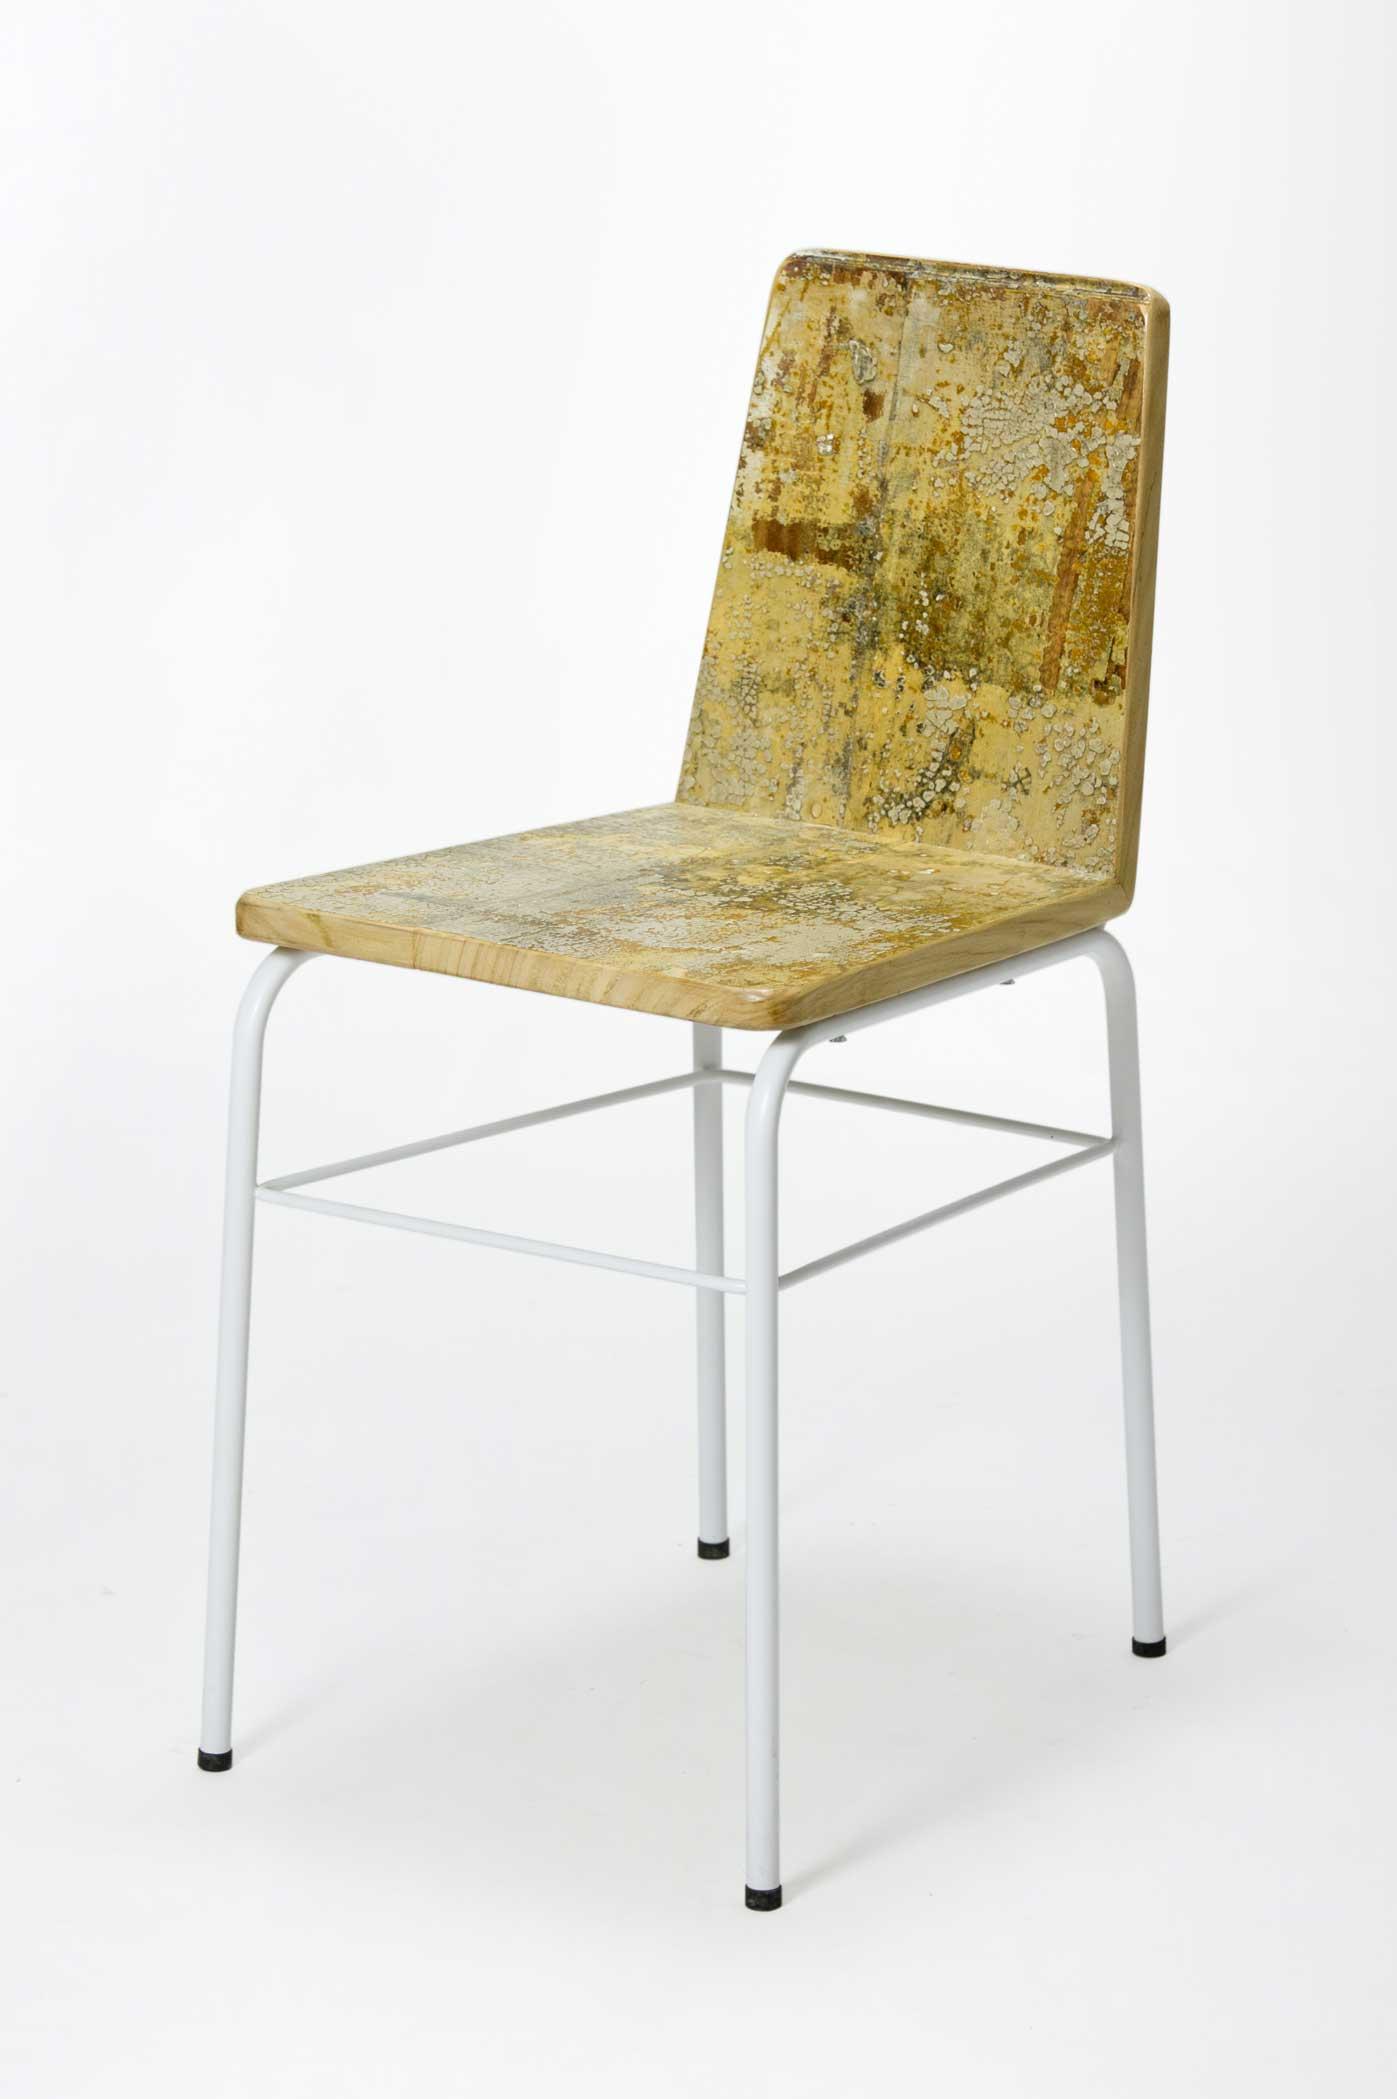 Sedie In Resina Colorate.Sedie Artigianali In Legno Nuovo E Vintage